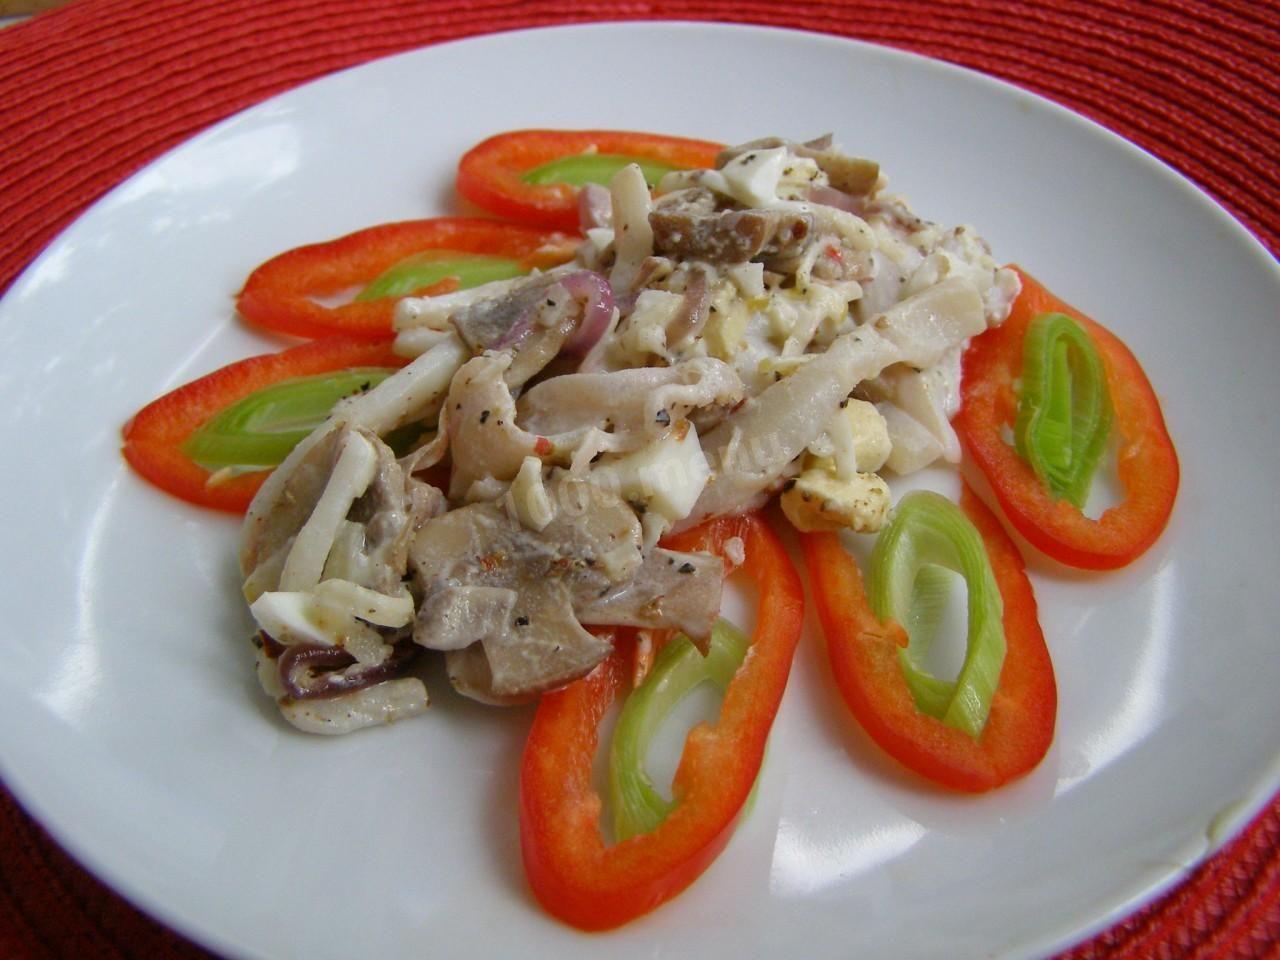 Салат с кальмарами и грибами | Рецепт | Кулинария, Салаты ...